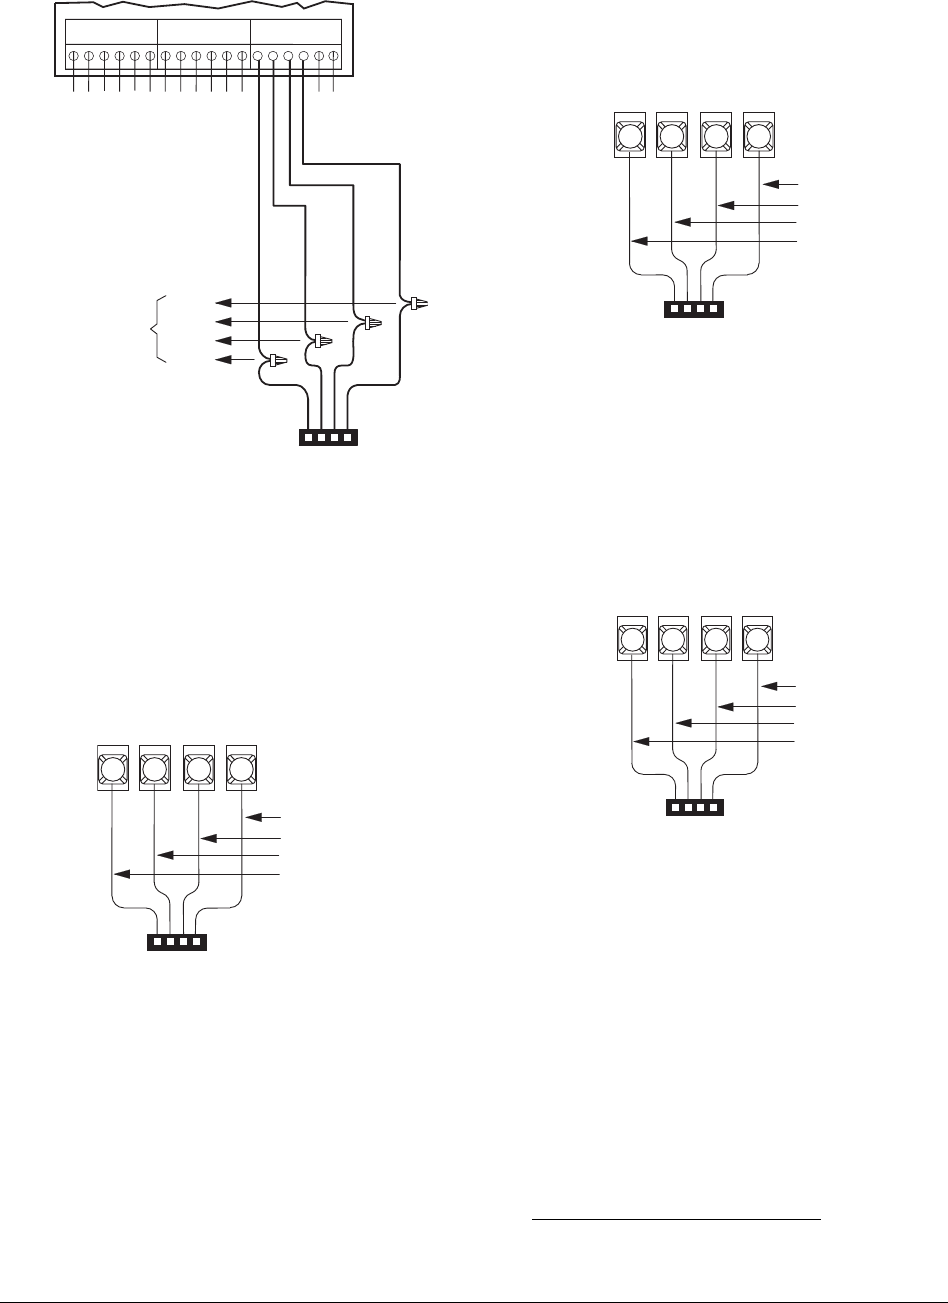 Rj31x Diagram - wiring diagrams schematics